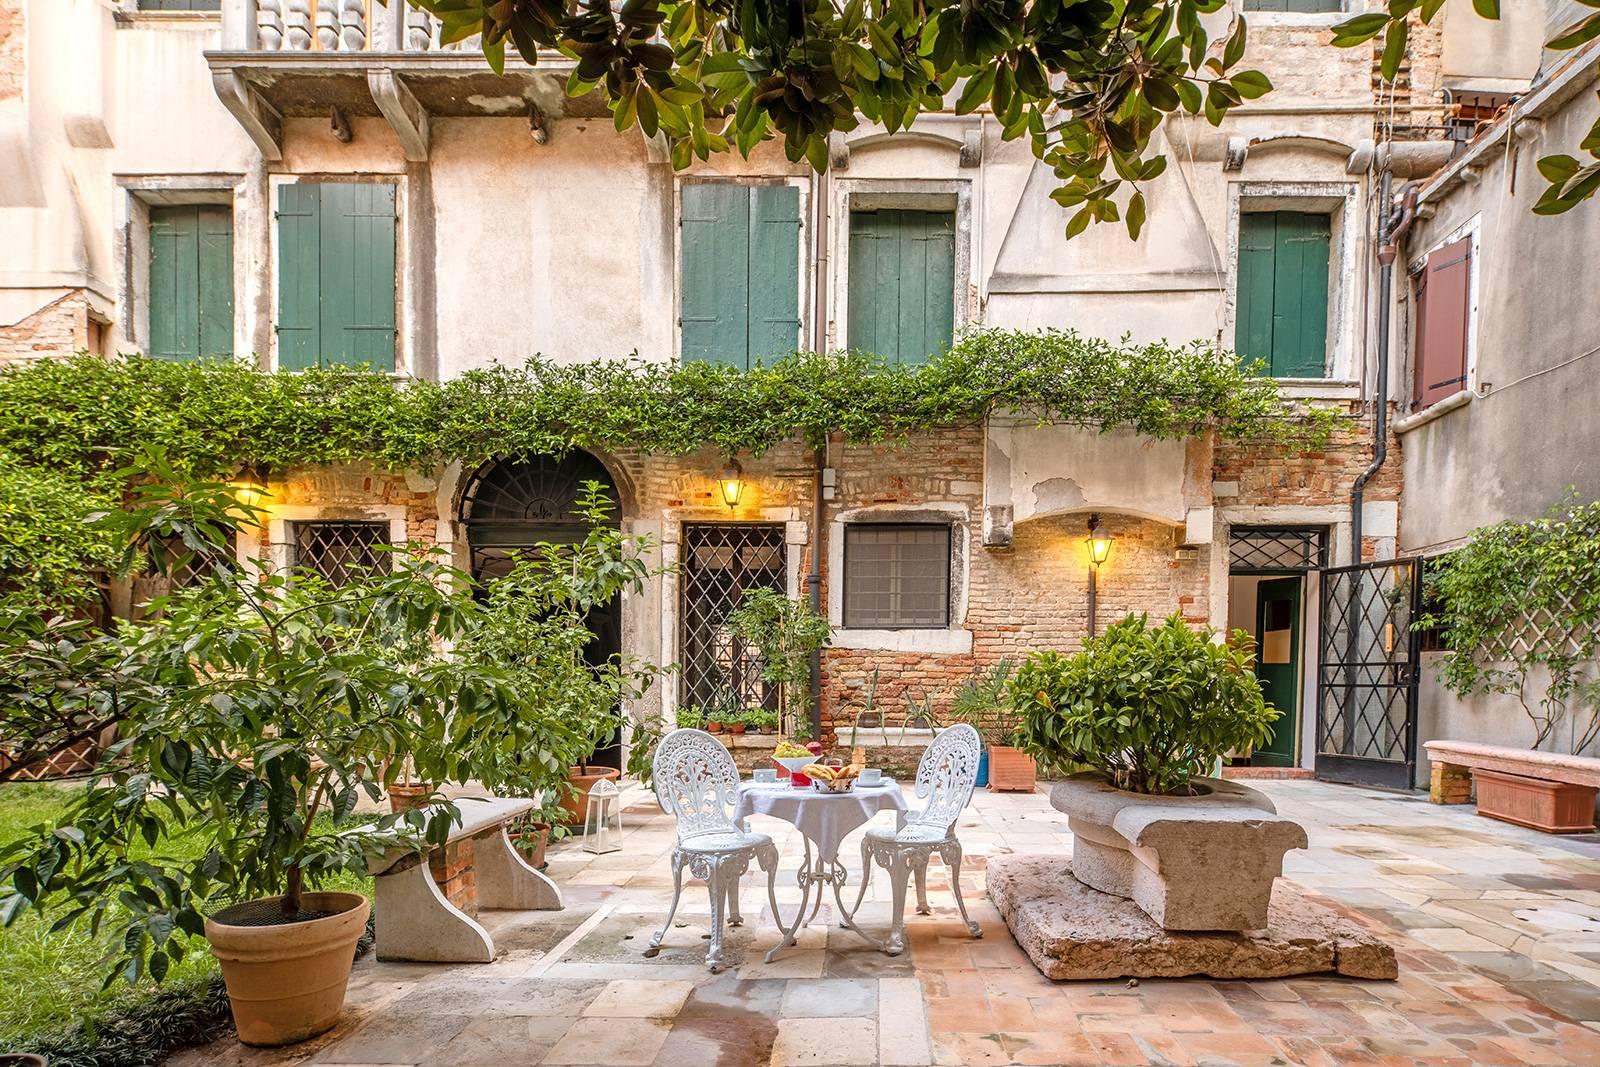 The Private Garden of the Brunelleschi Studio